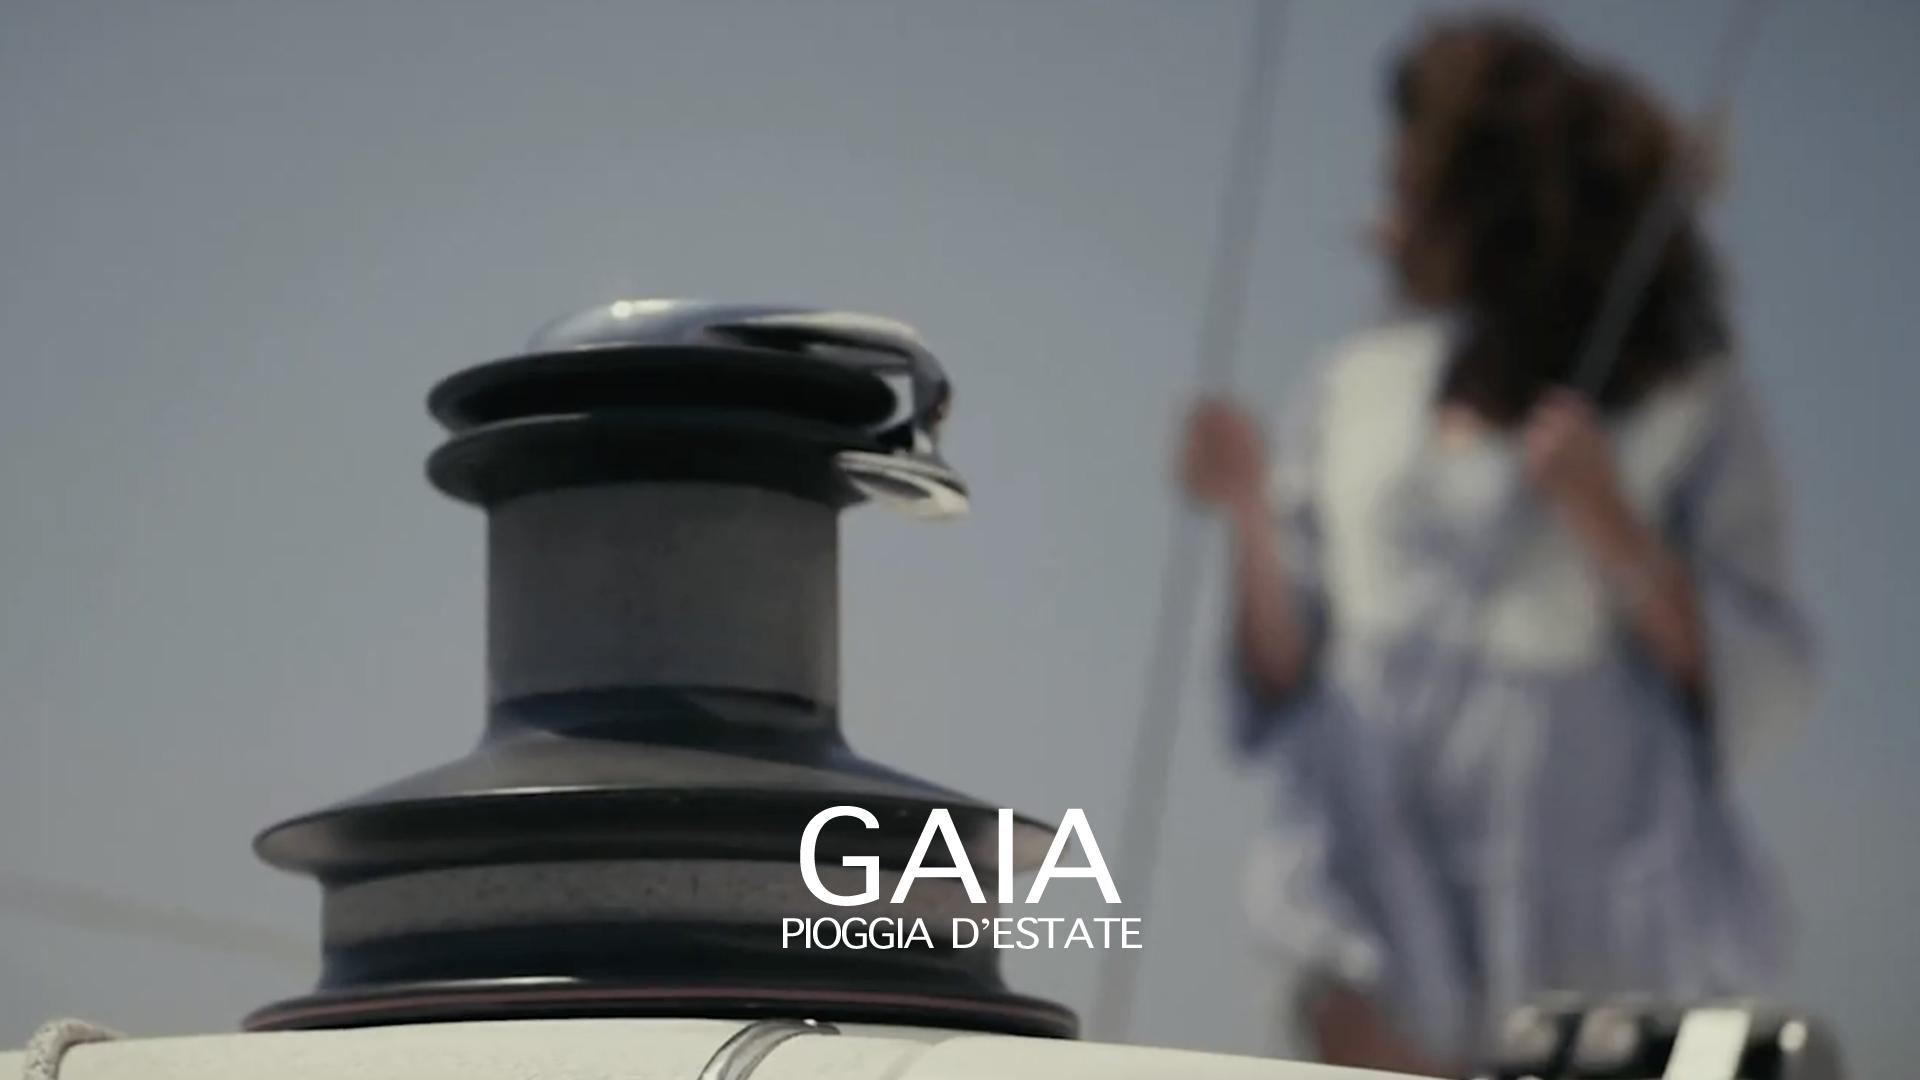 Copertina Video Gaia pioggia d'estate